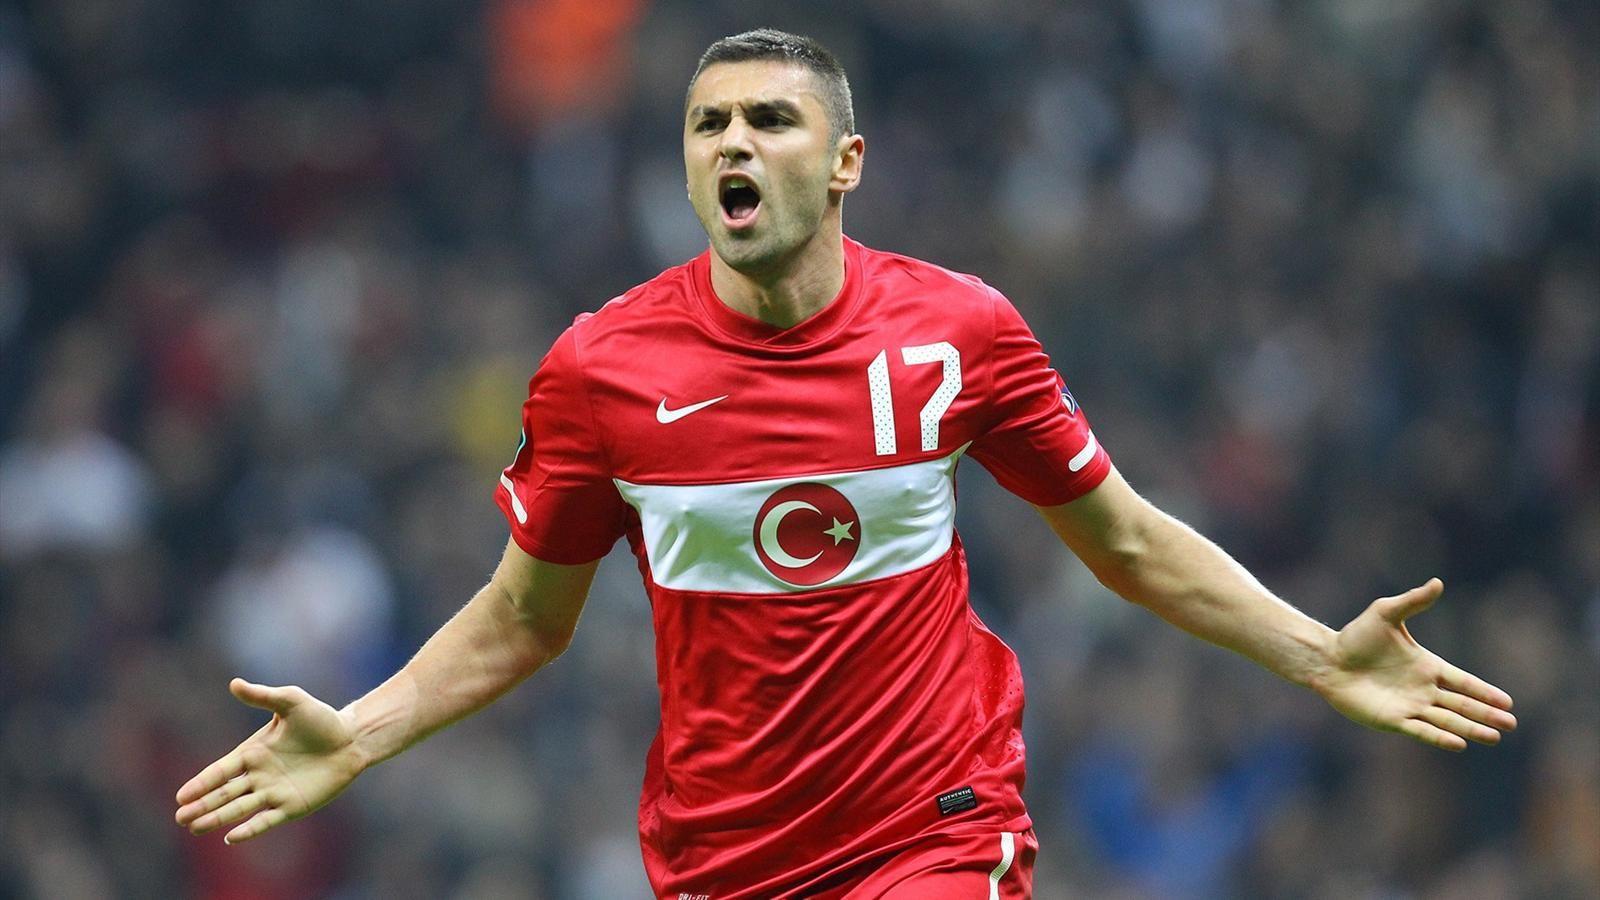 Euro 2016. Cehia - Turcia, rezultat final 0-2. Rezumat video